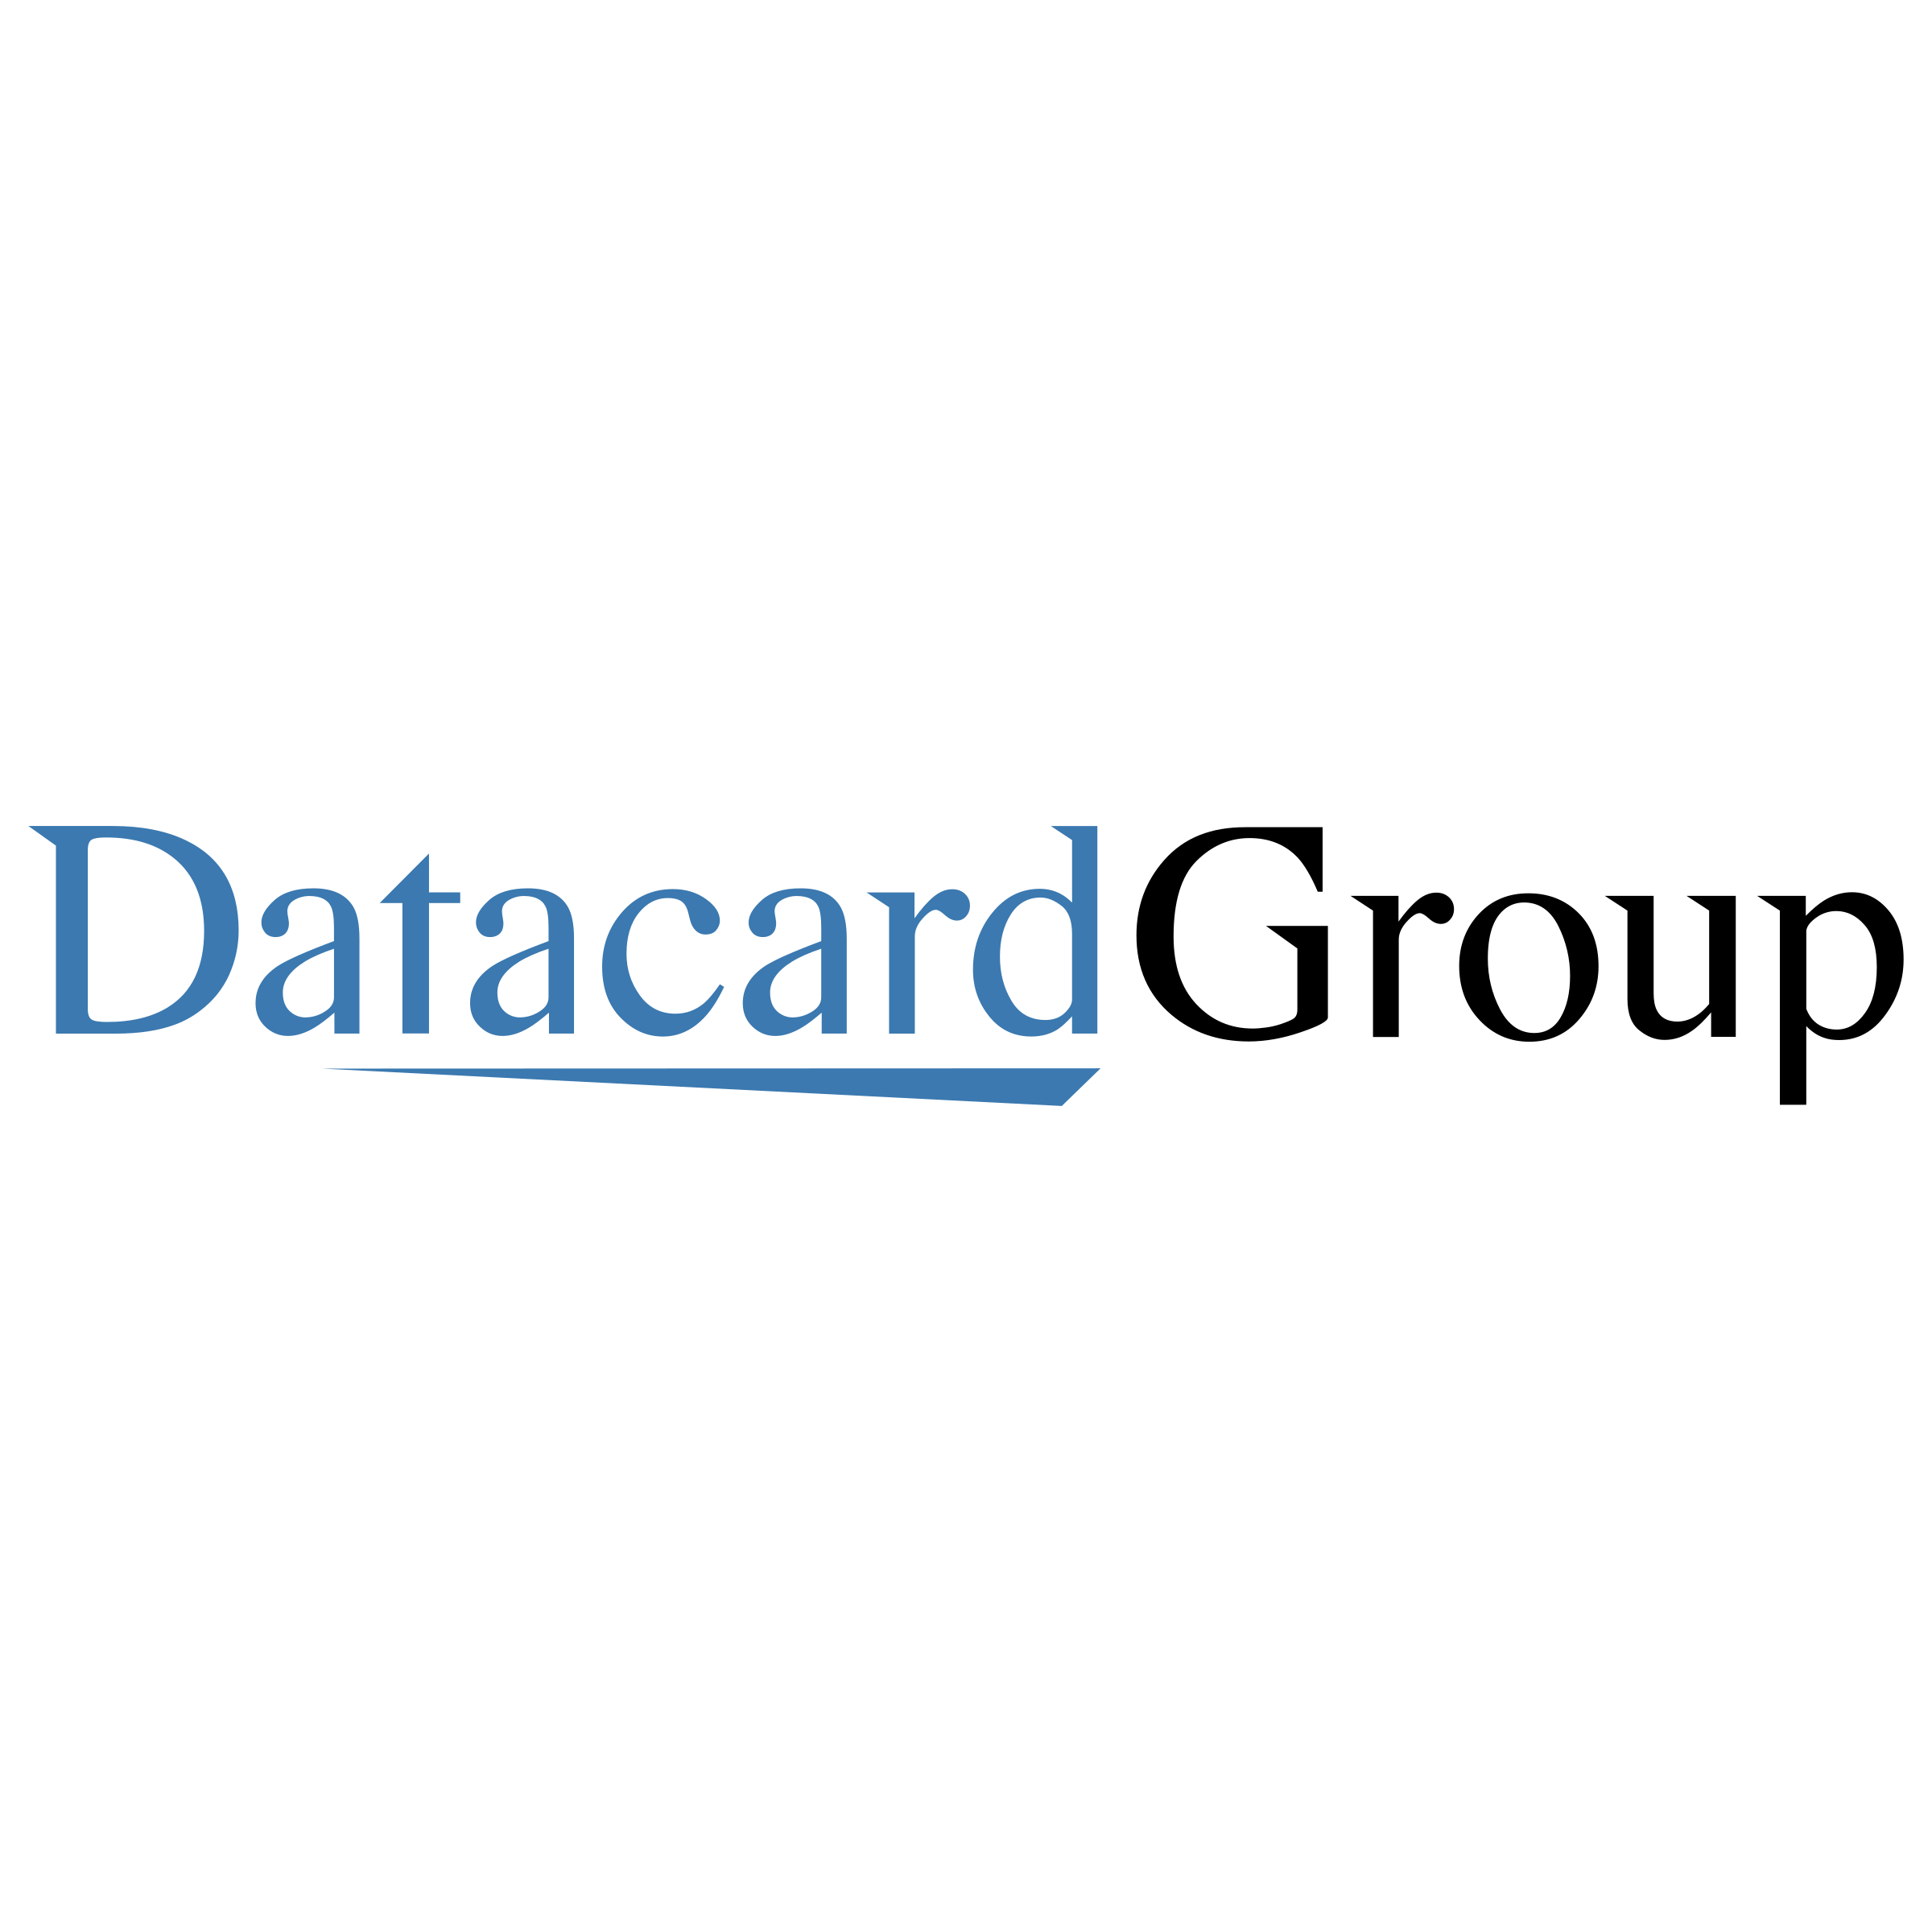 Logo Vector - Supply Datacard Svg Freebie Group Png Transparent amp;